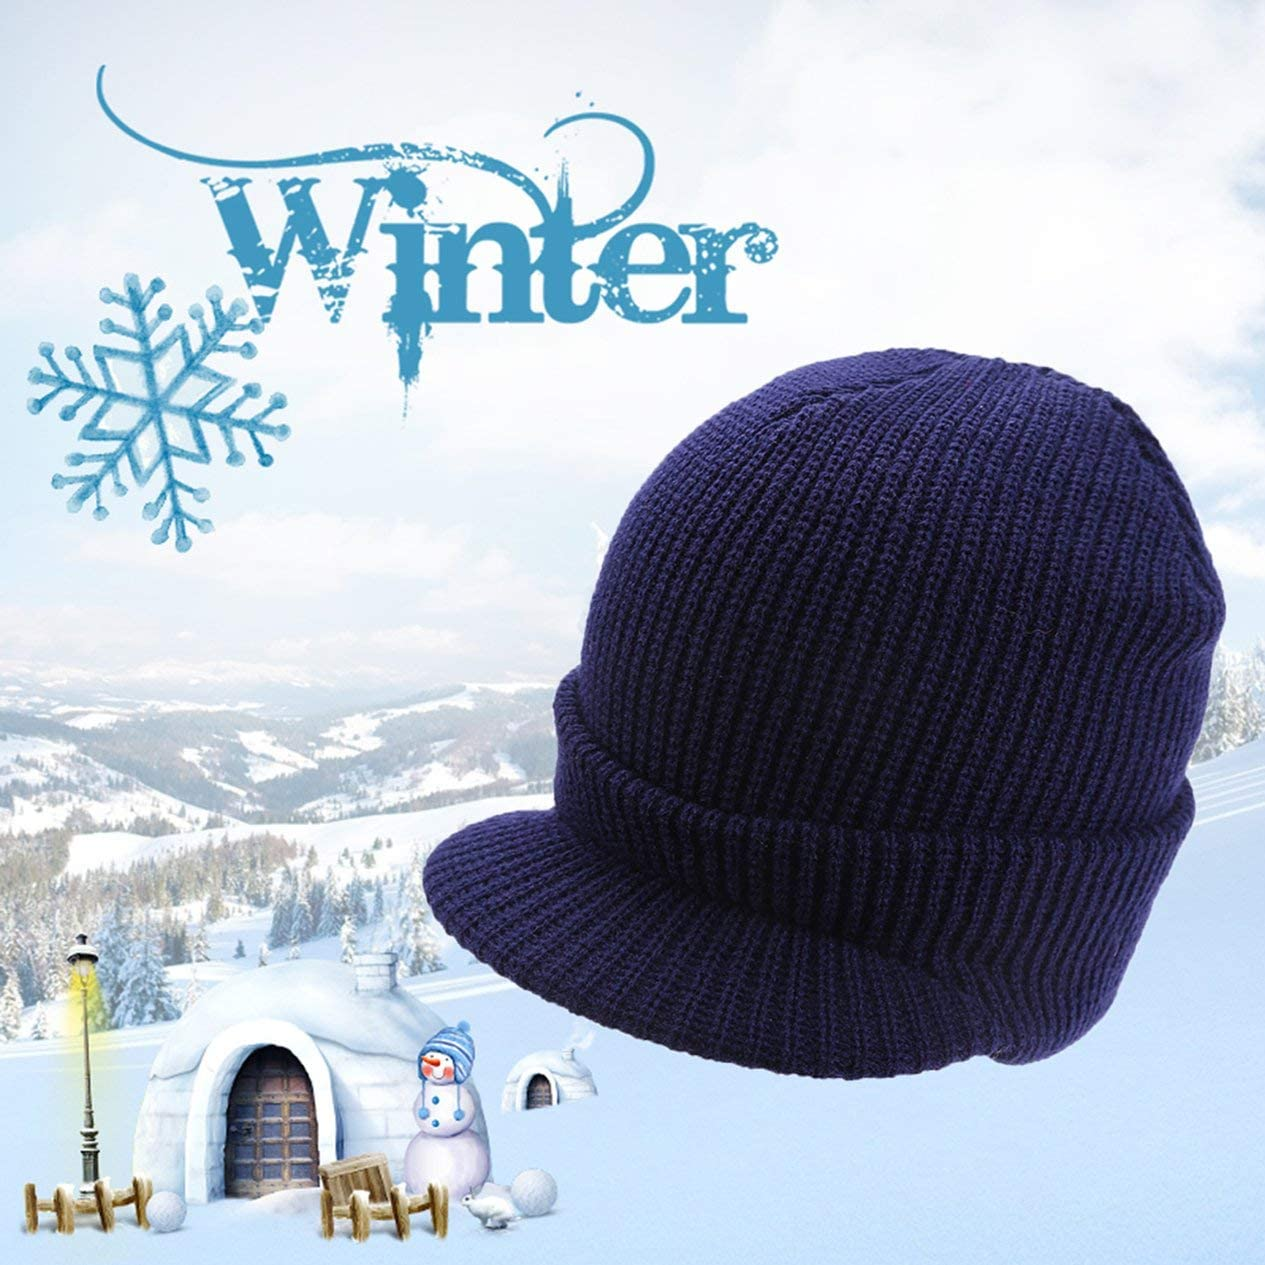 Trendy Men Women Winter Elastic Knitting Hat Wool /& Polyester Thick Warm Sport Cap Hat Beanie Skull Cap Daily Slouchy Hats